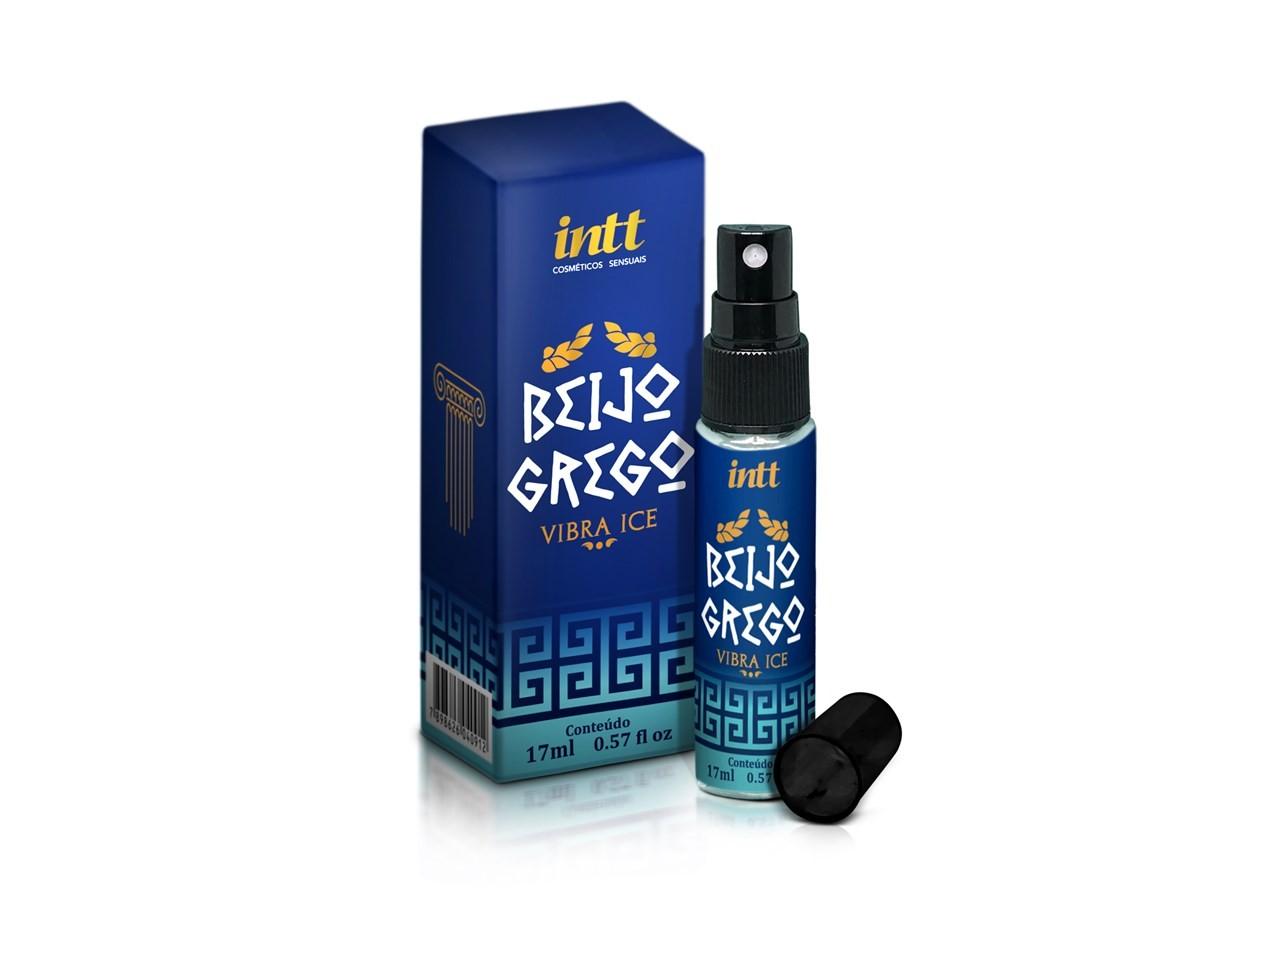 Excitante anal beijável Beijo Grego 17 ml